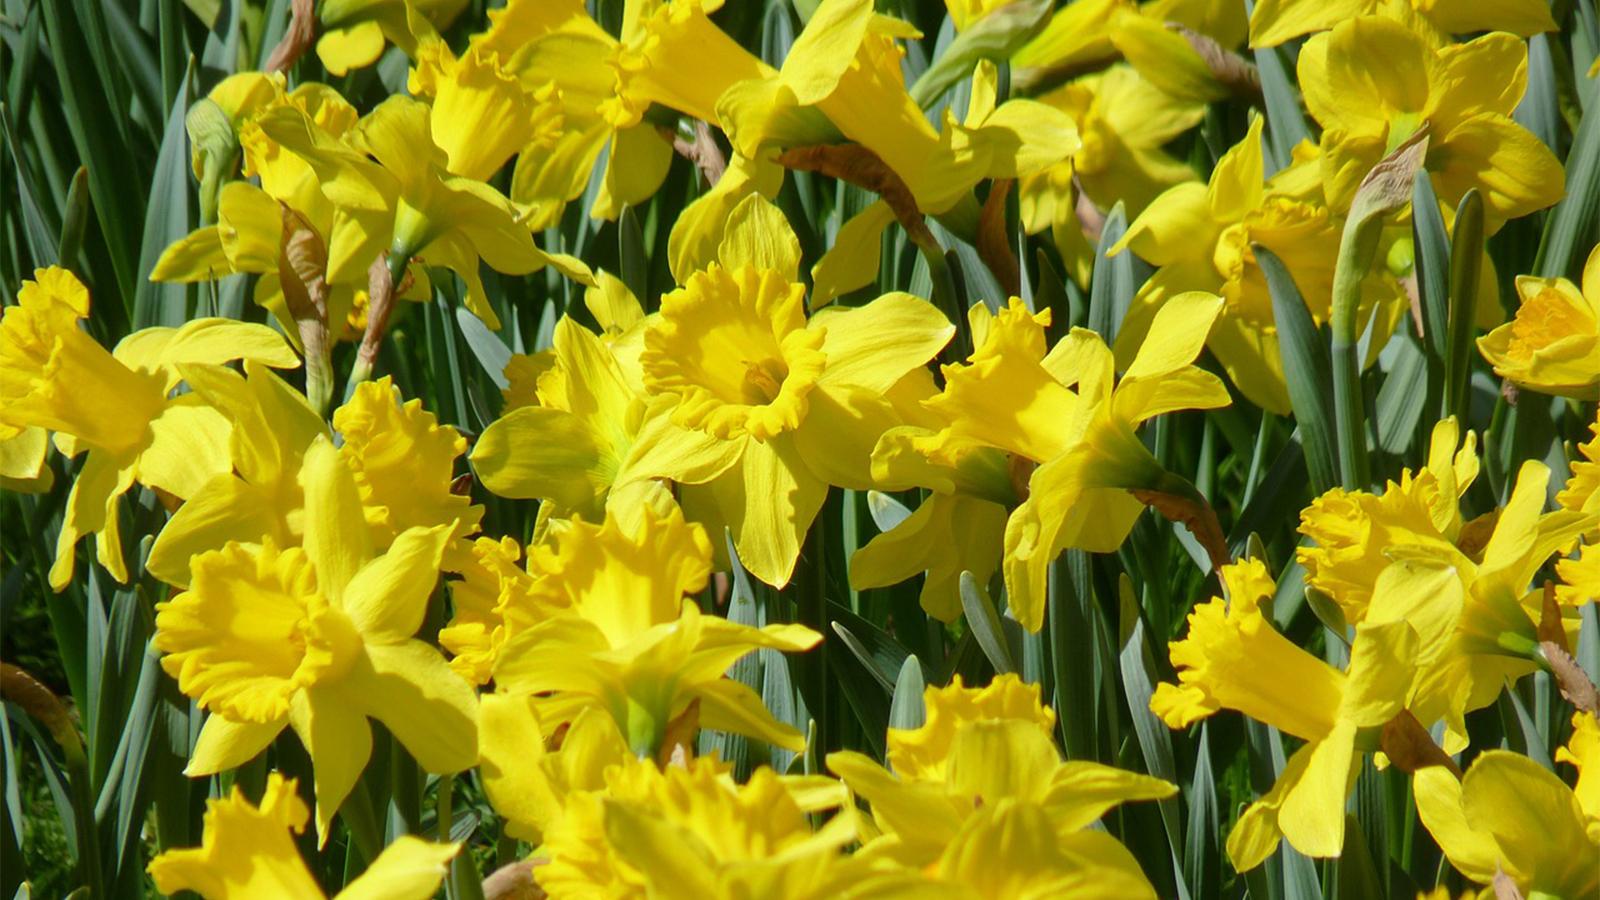 Daffodils-New Baby Flower